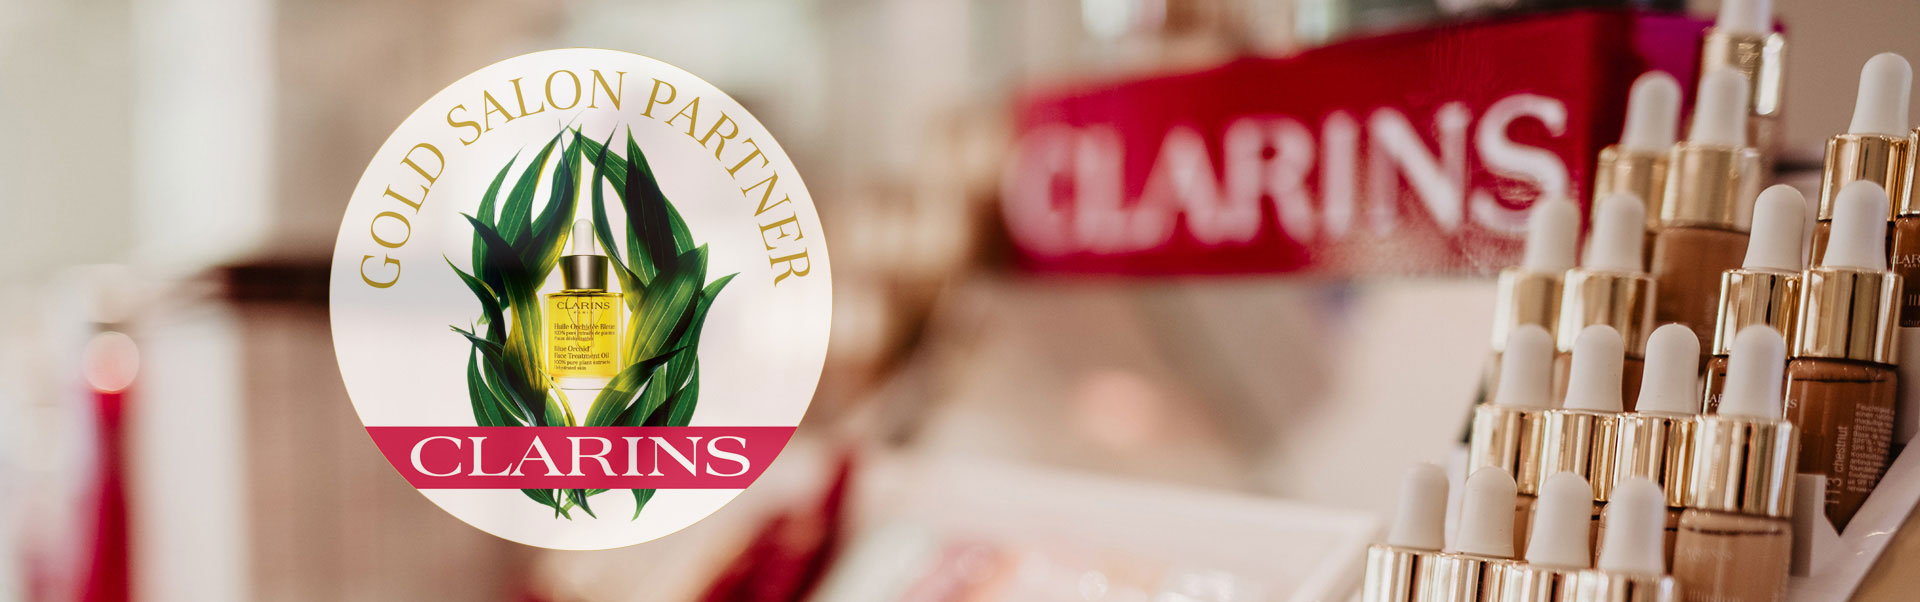 Clarins Gold Standard Partner